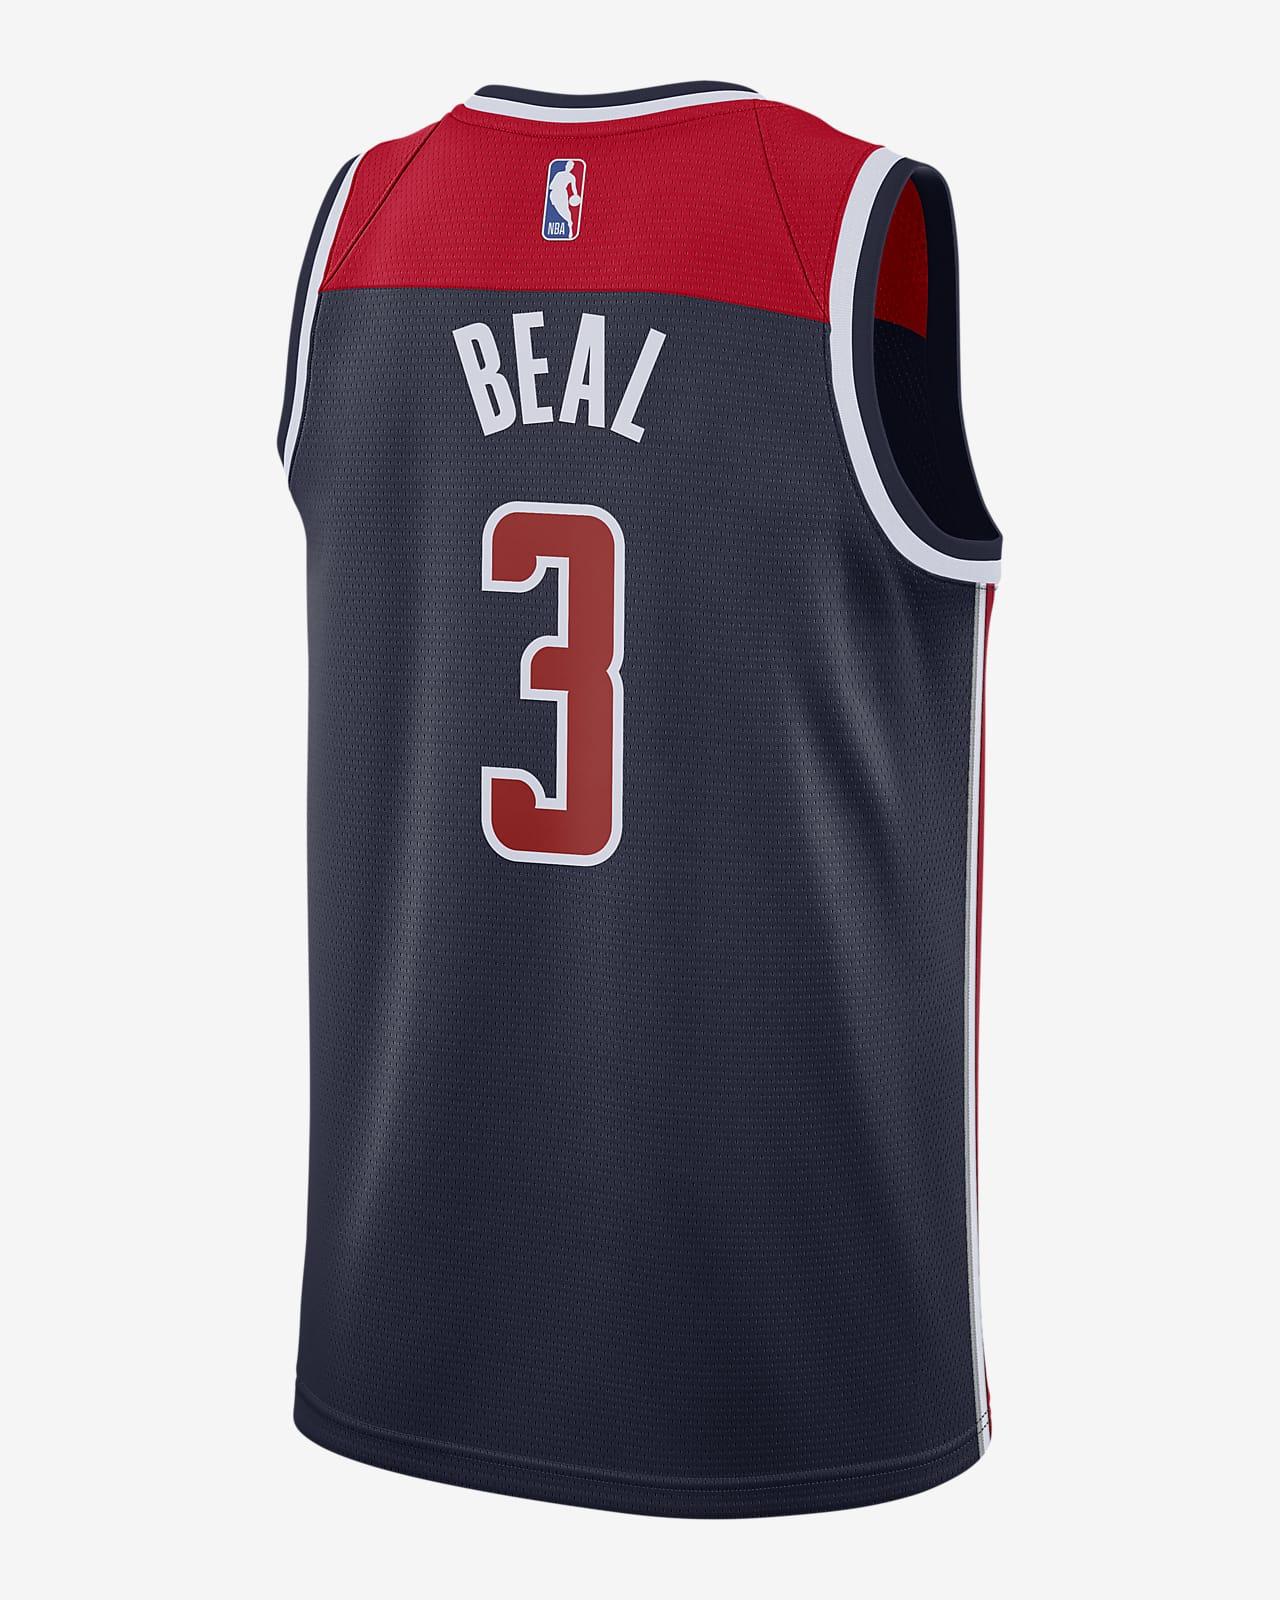 Bradley Beal Wizards Statement Edition 2020 Jordan NBA Swingman Jersey